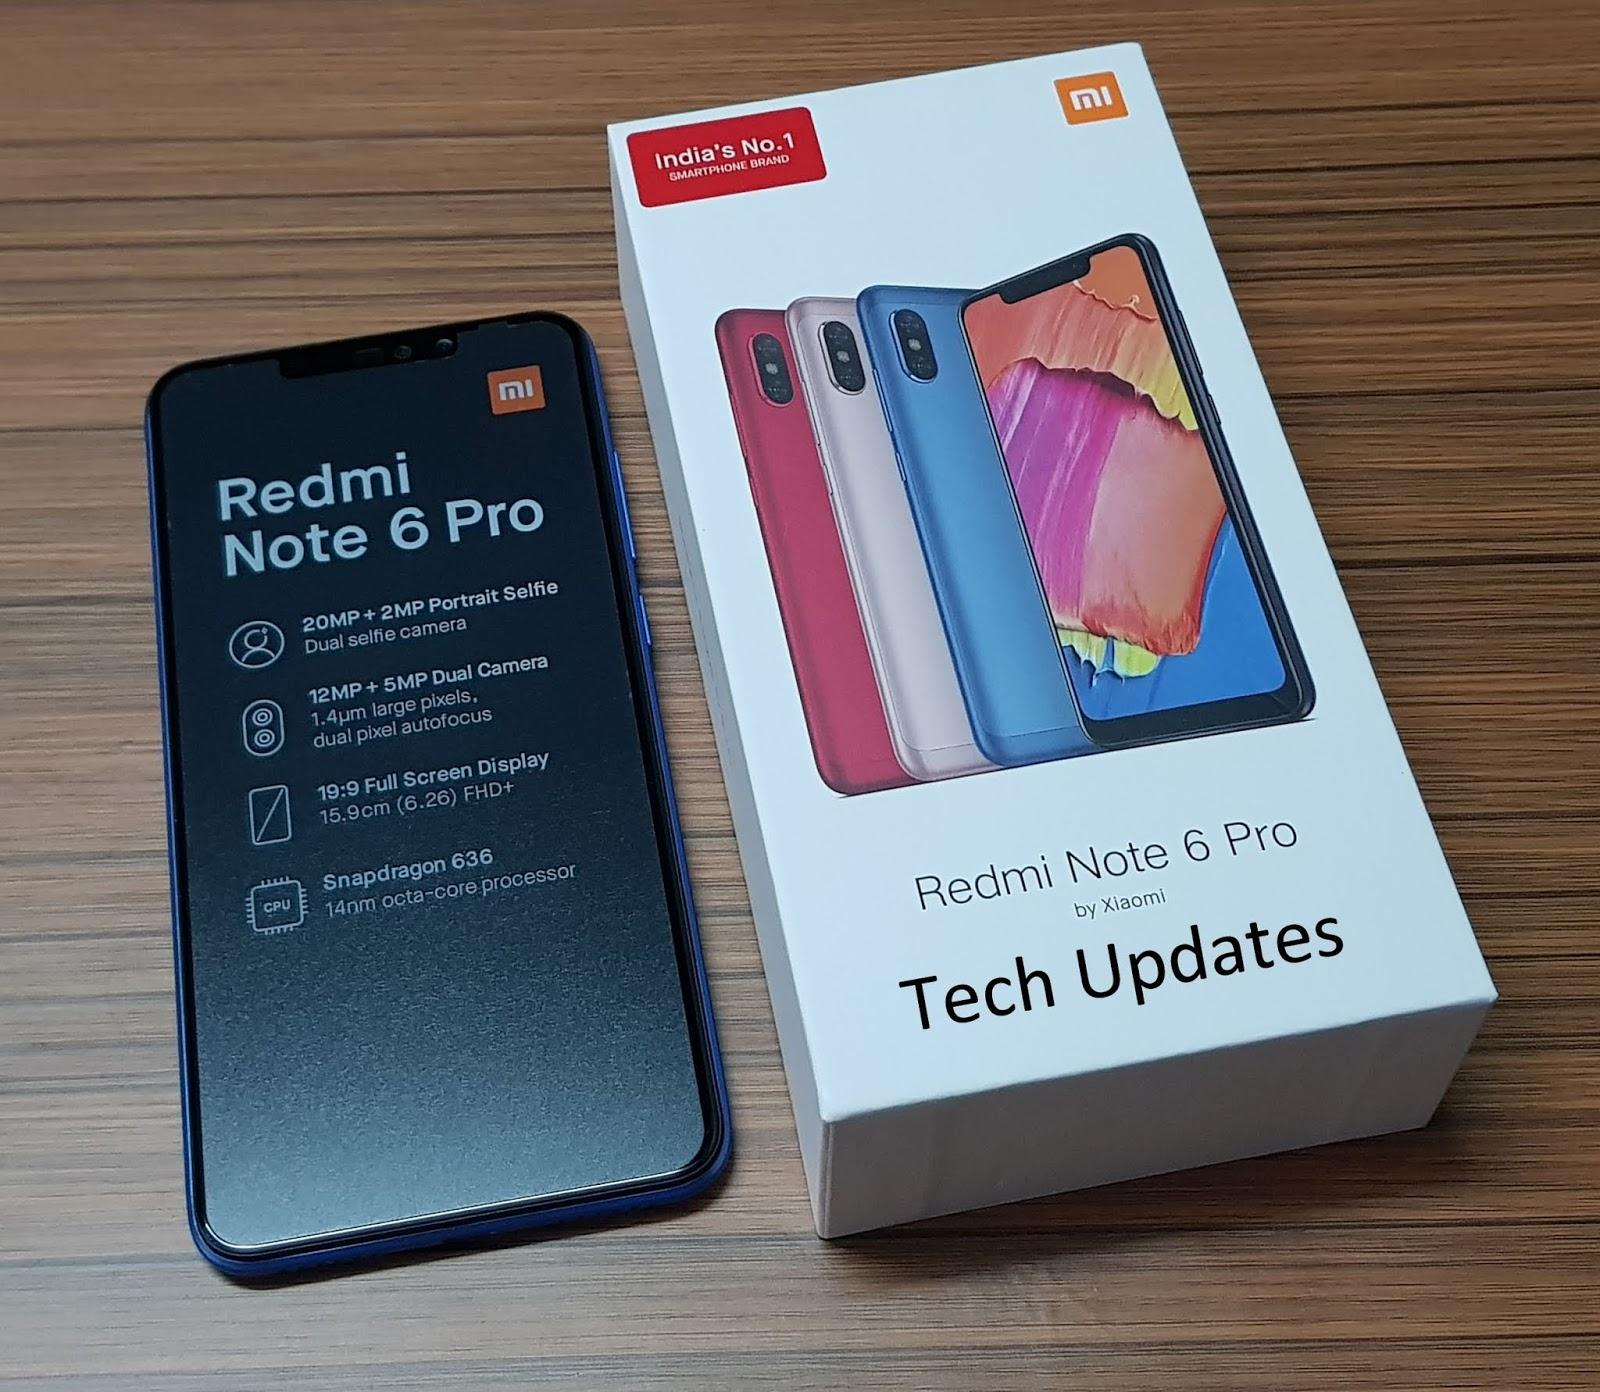 Xiaomi Redmi Note 6 Pro Tips, Tricks, Pros, Cons - Tech Updates